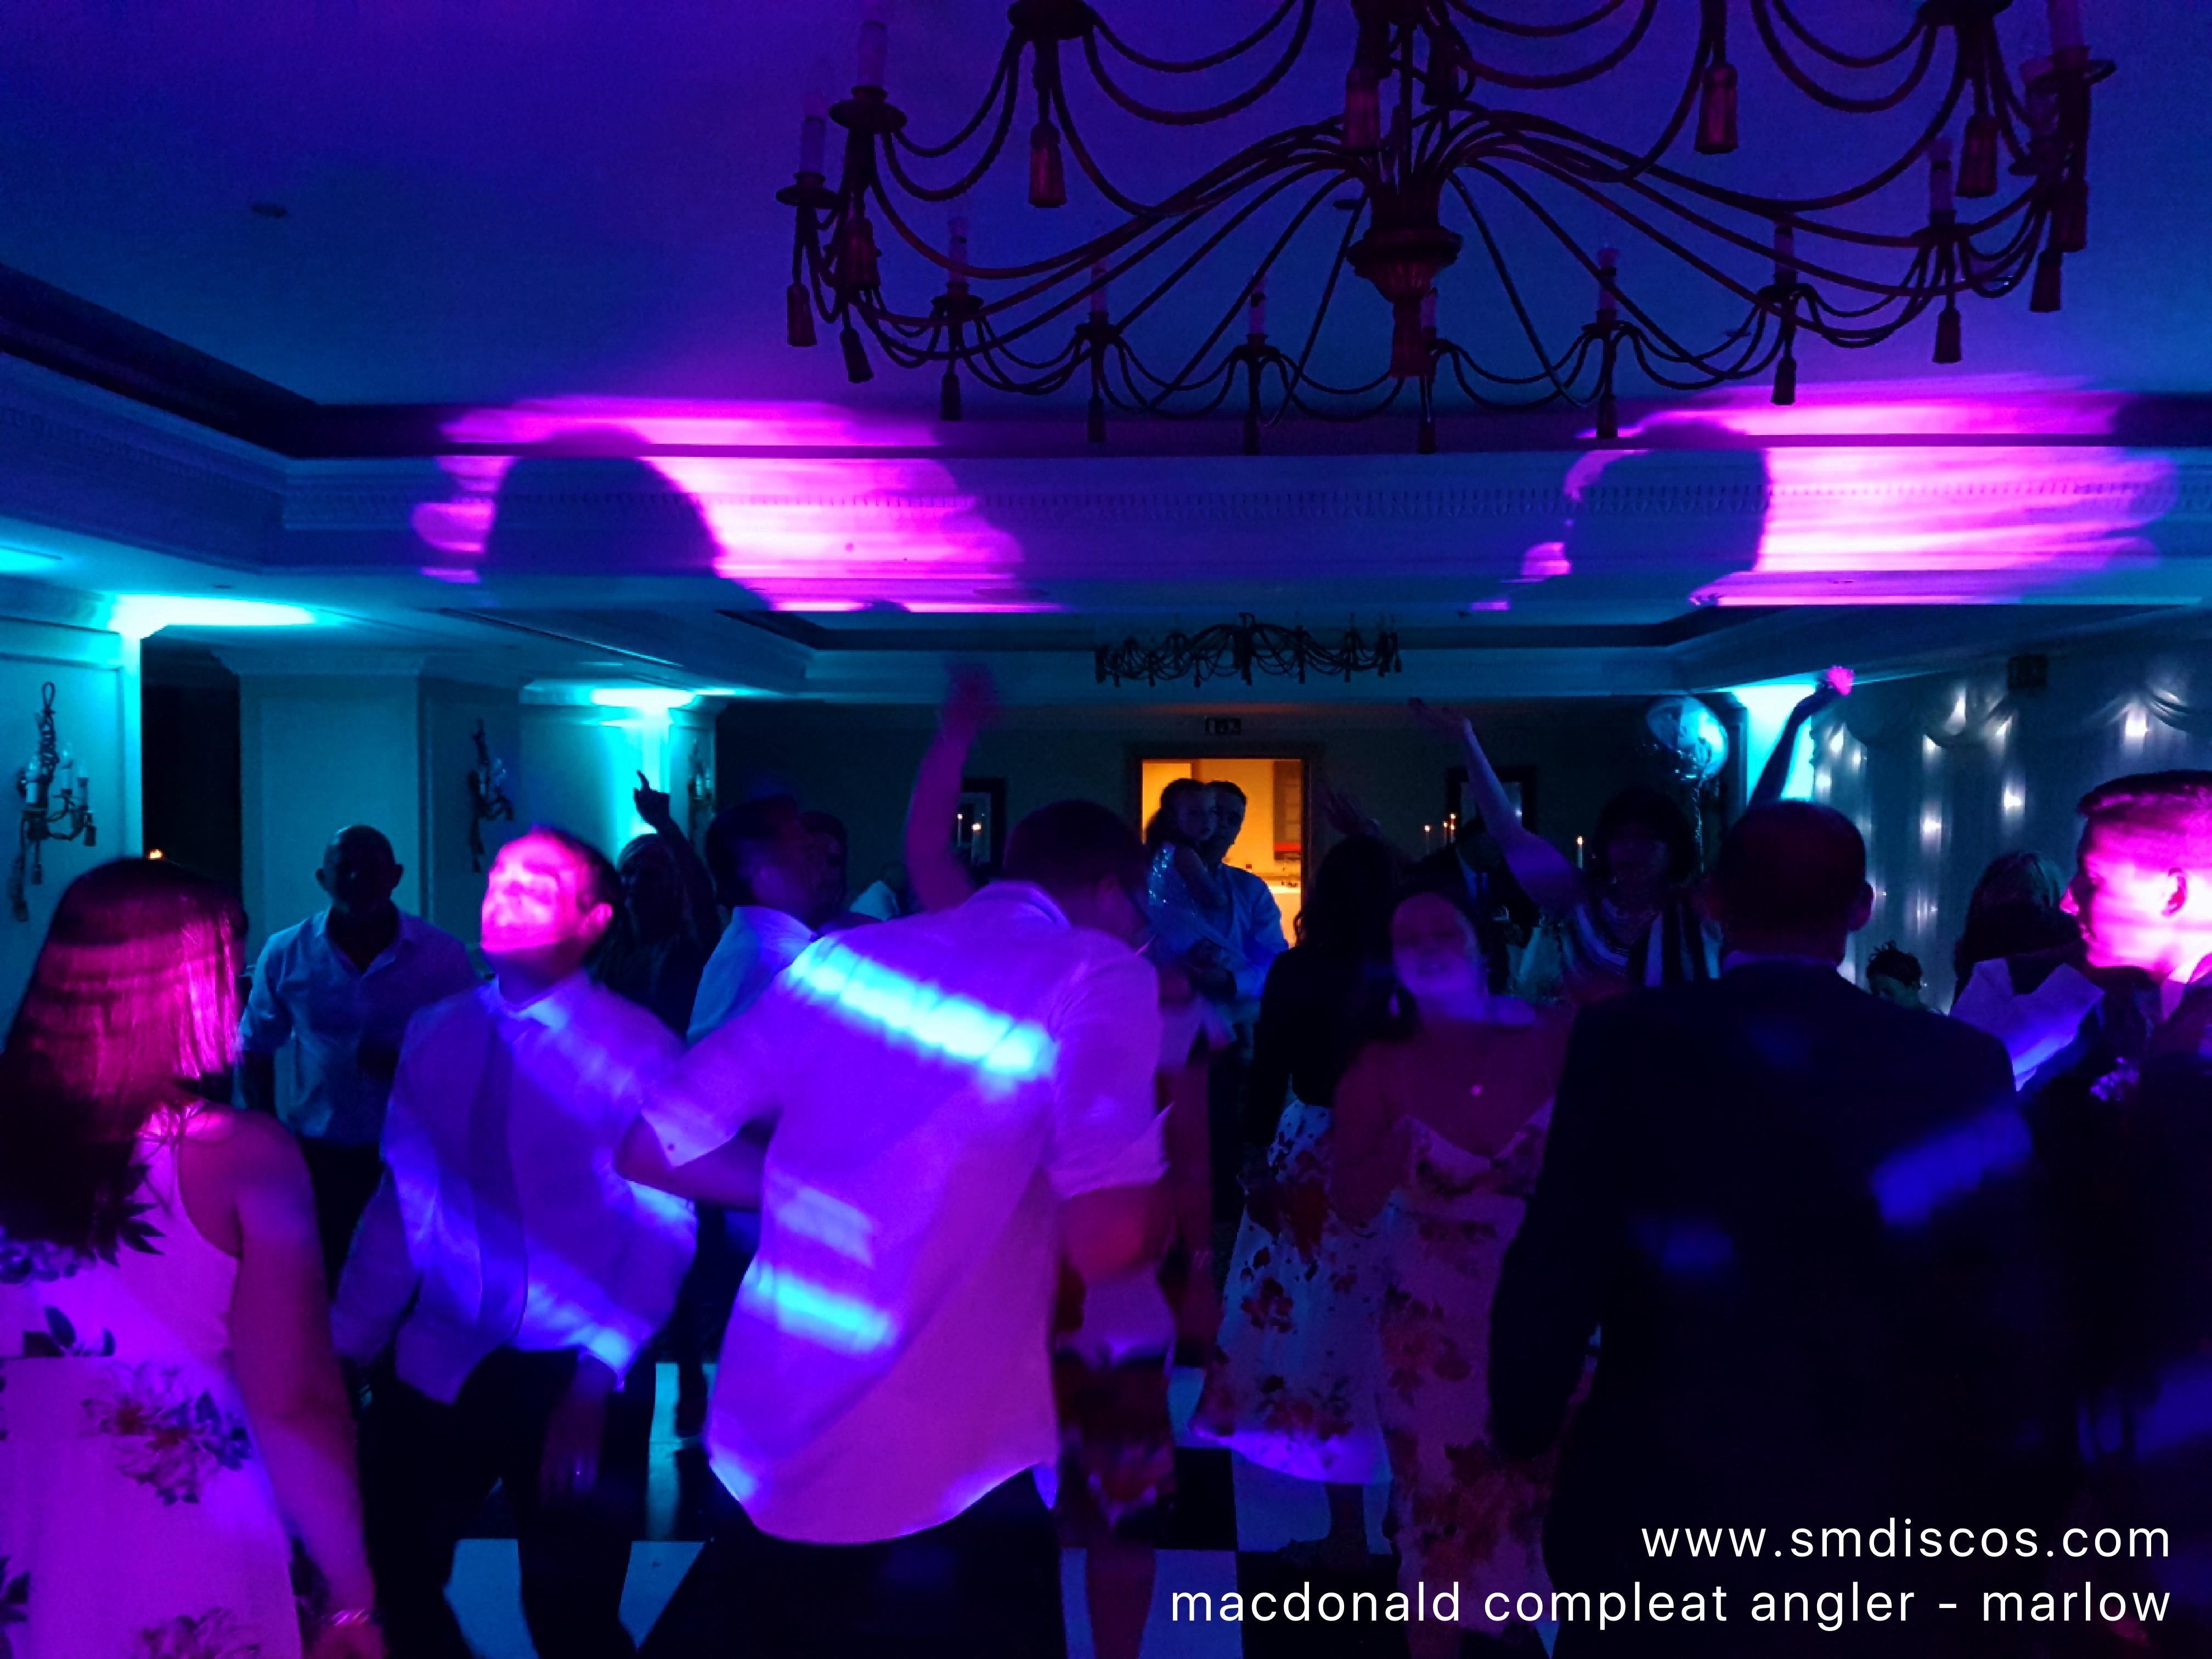 Compleat angler wedding dj disco